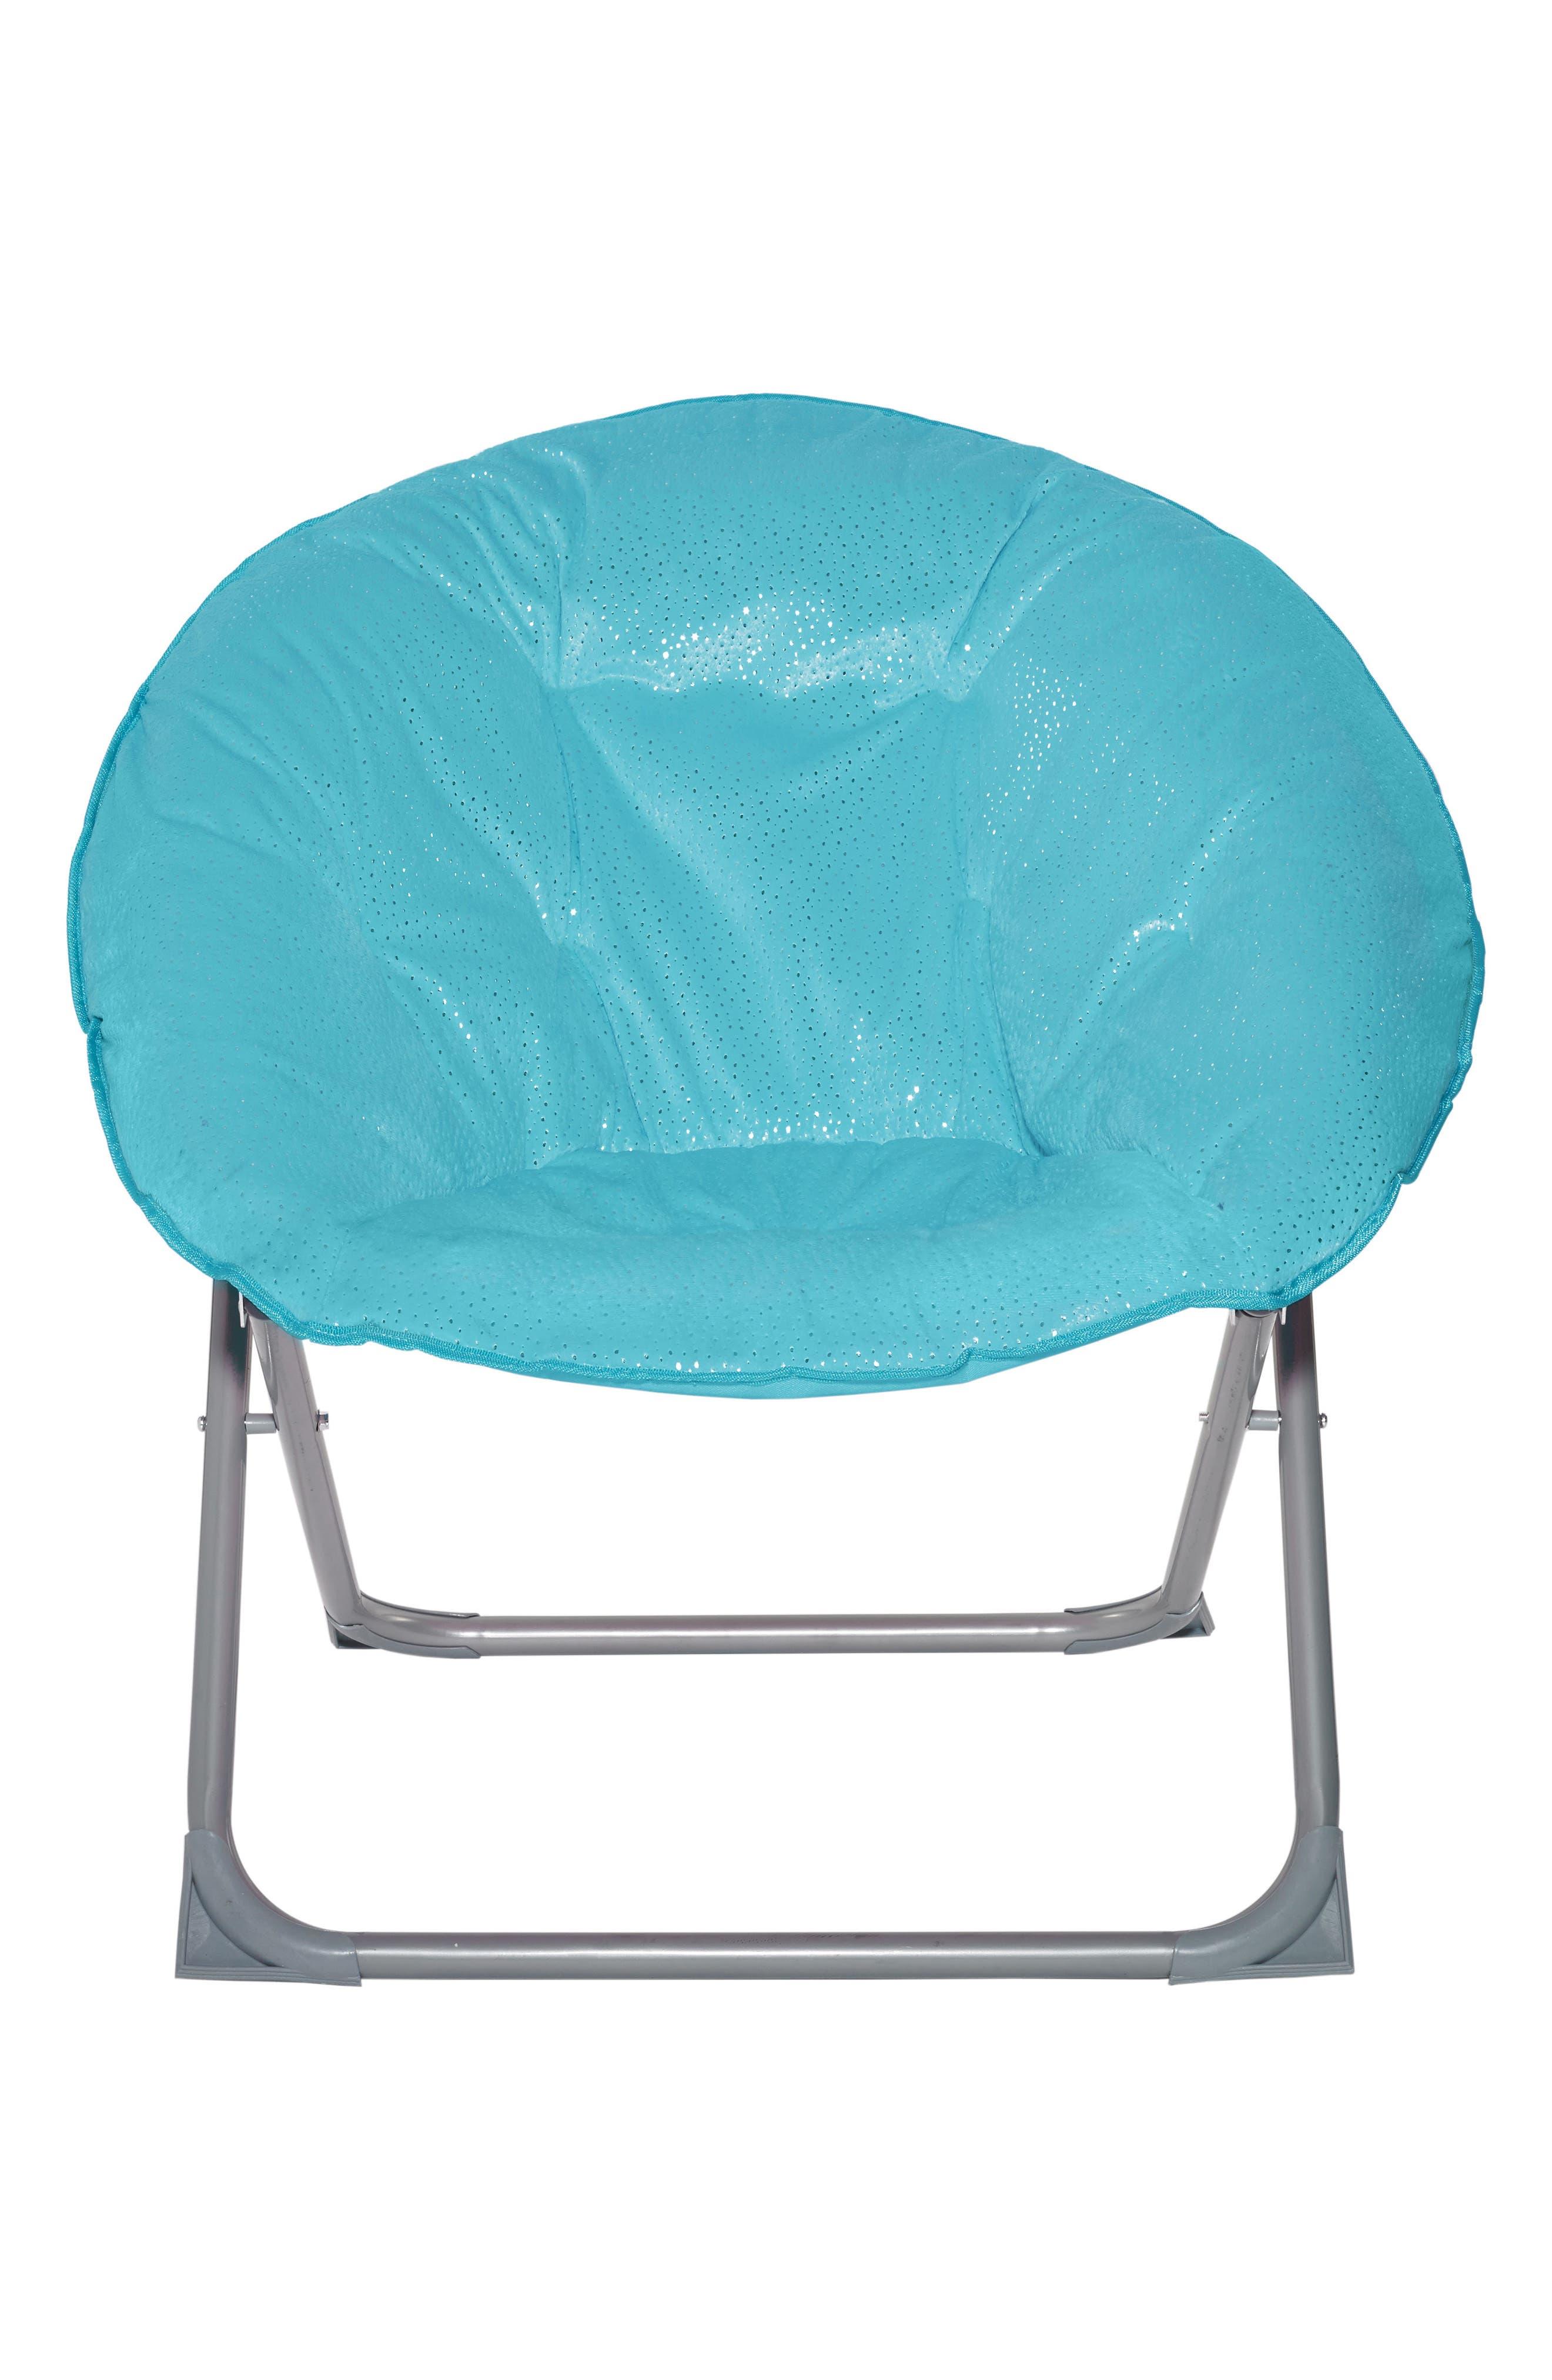 Sparkle Moon Chair,                             Main thumbnail 1, color,                             Turquoise